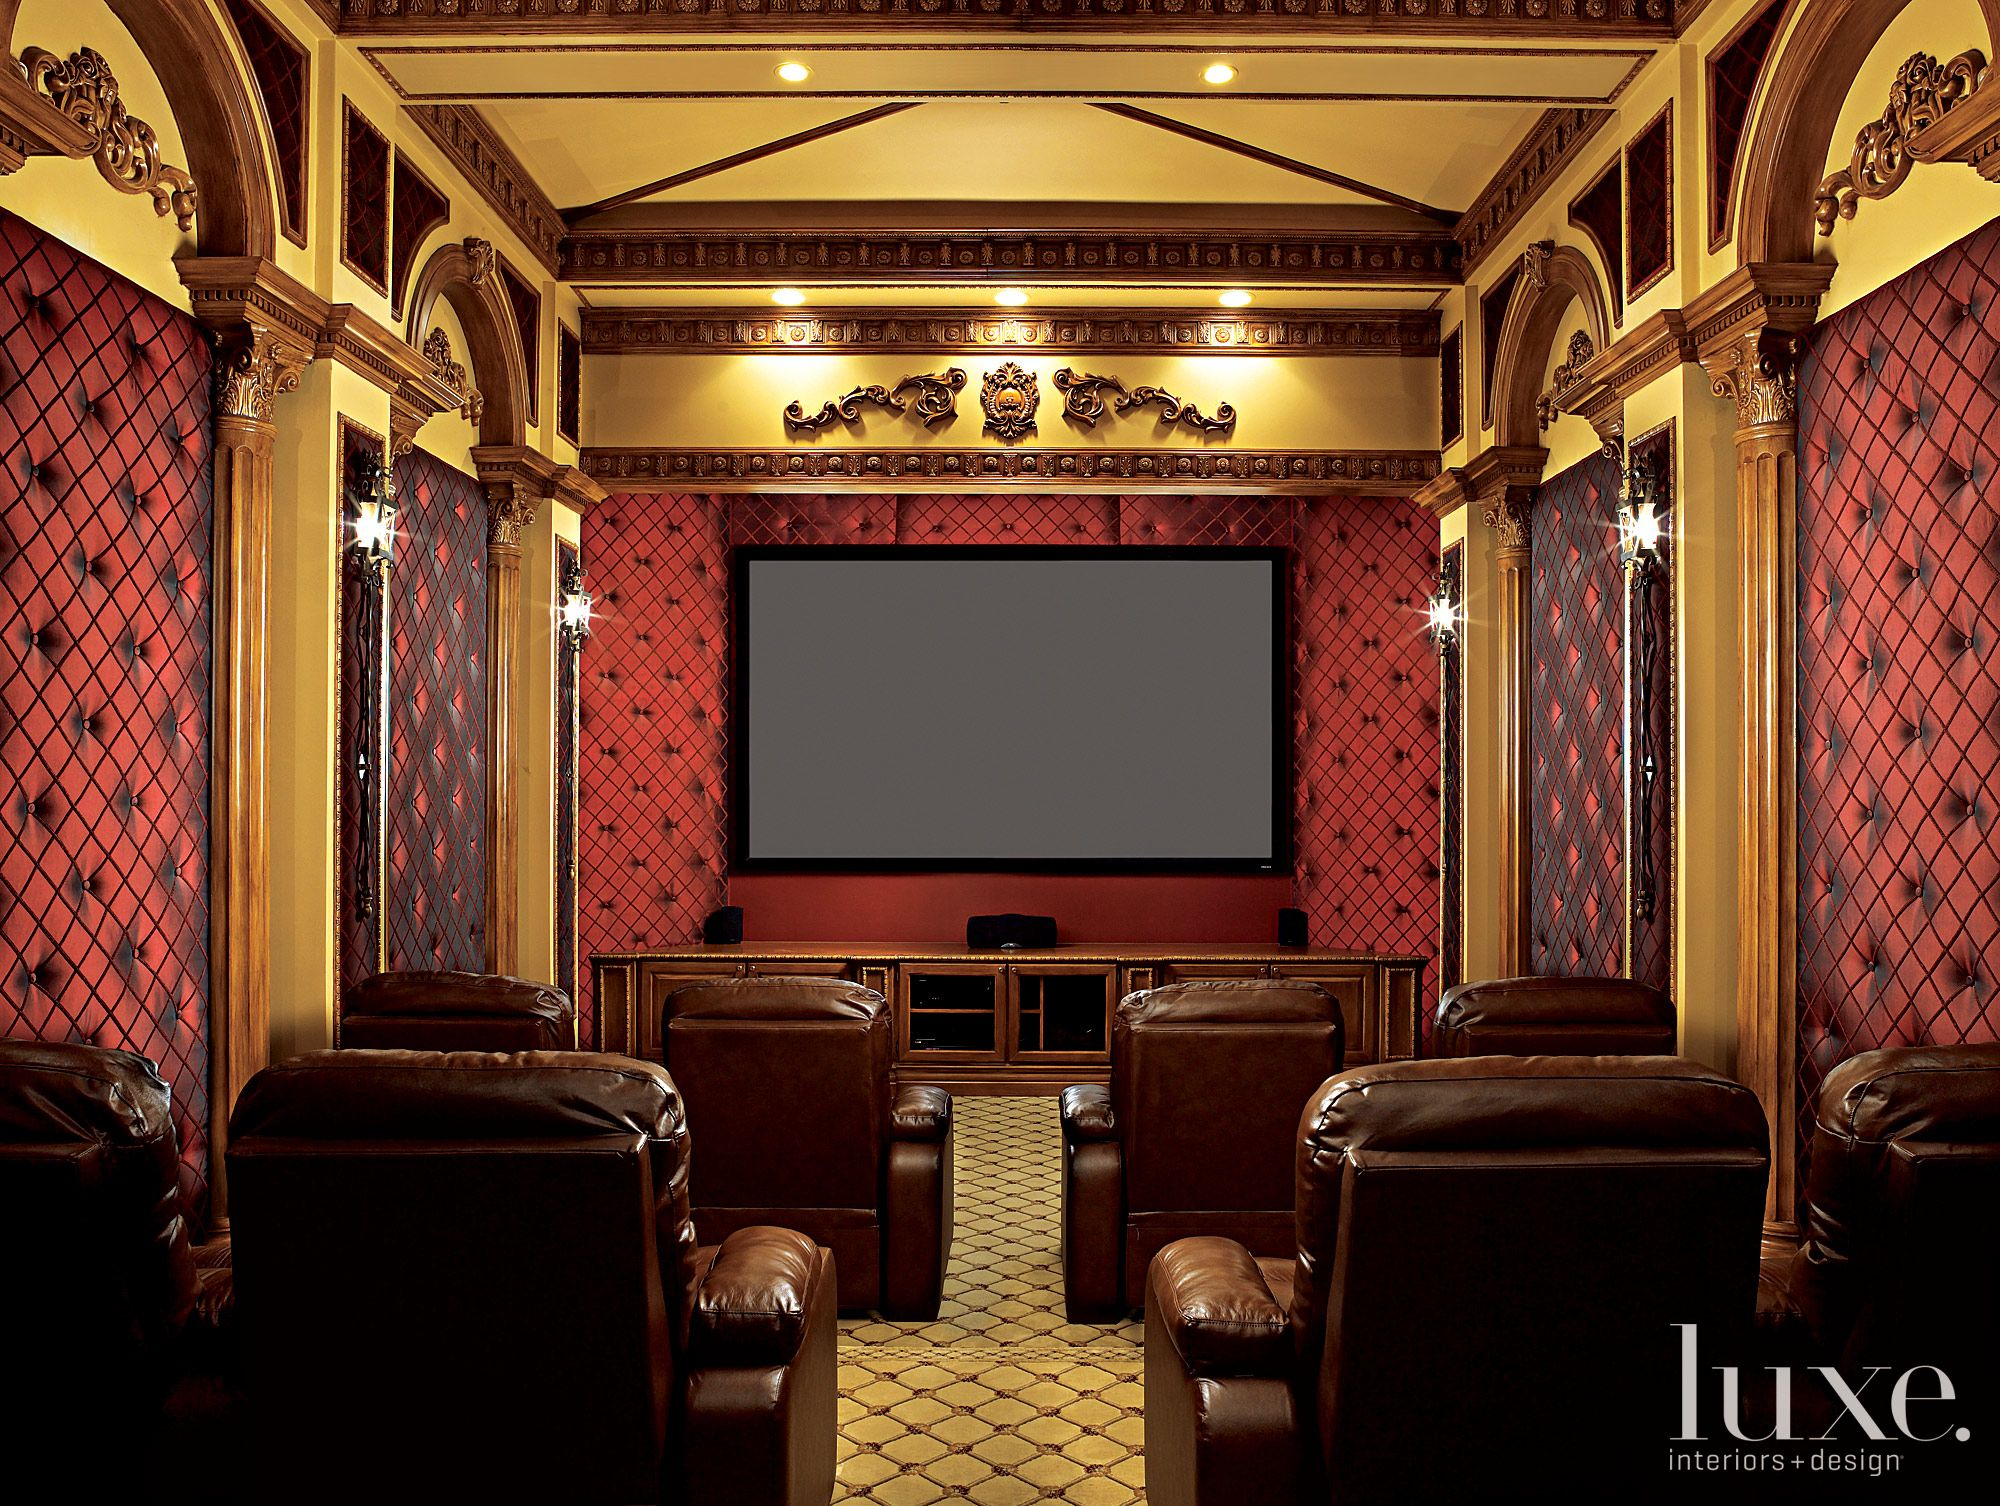 Luxe Florida | Luxe | Media | Pinterest | Basement movie room ...